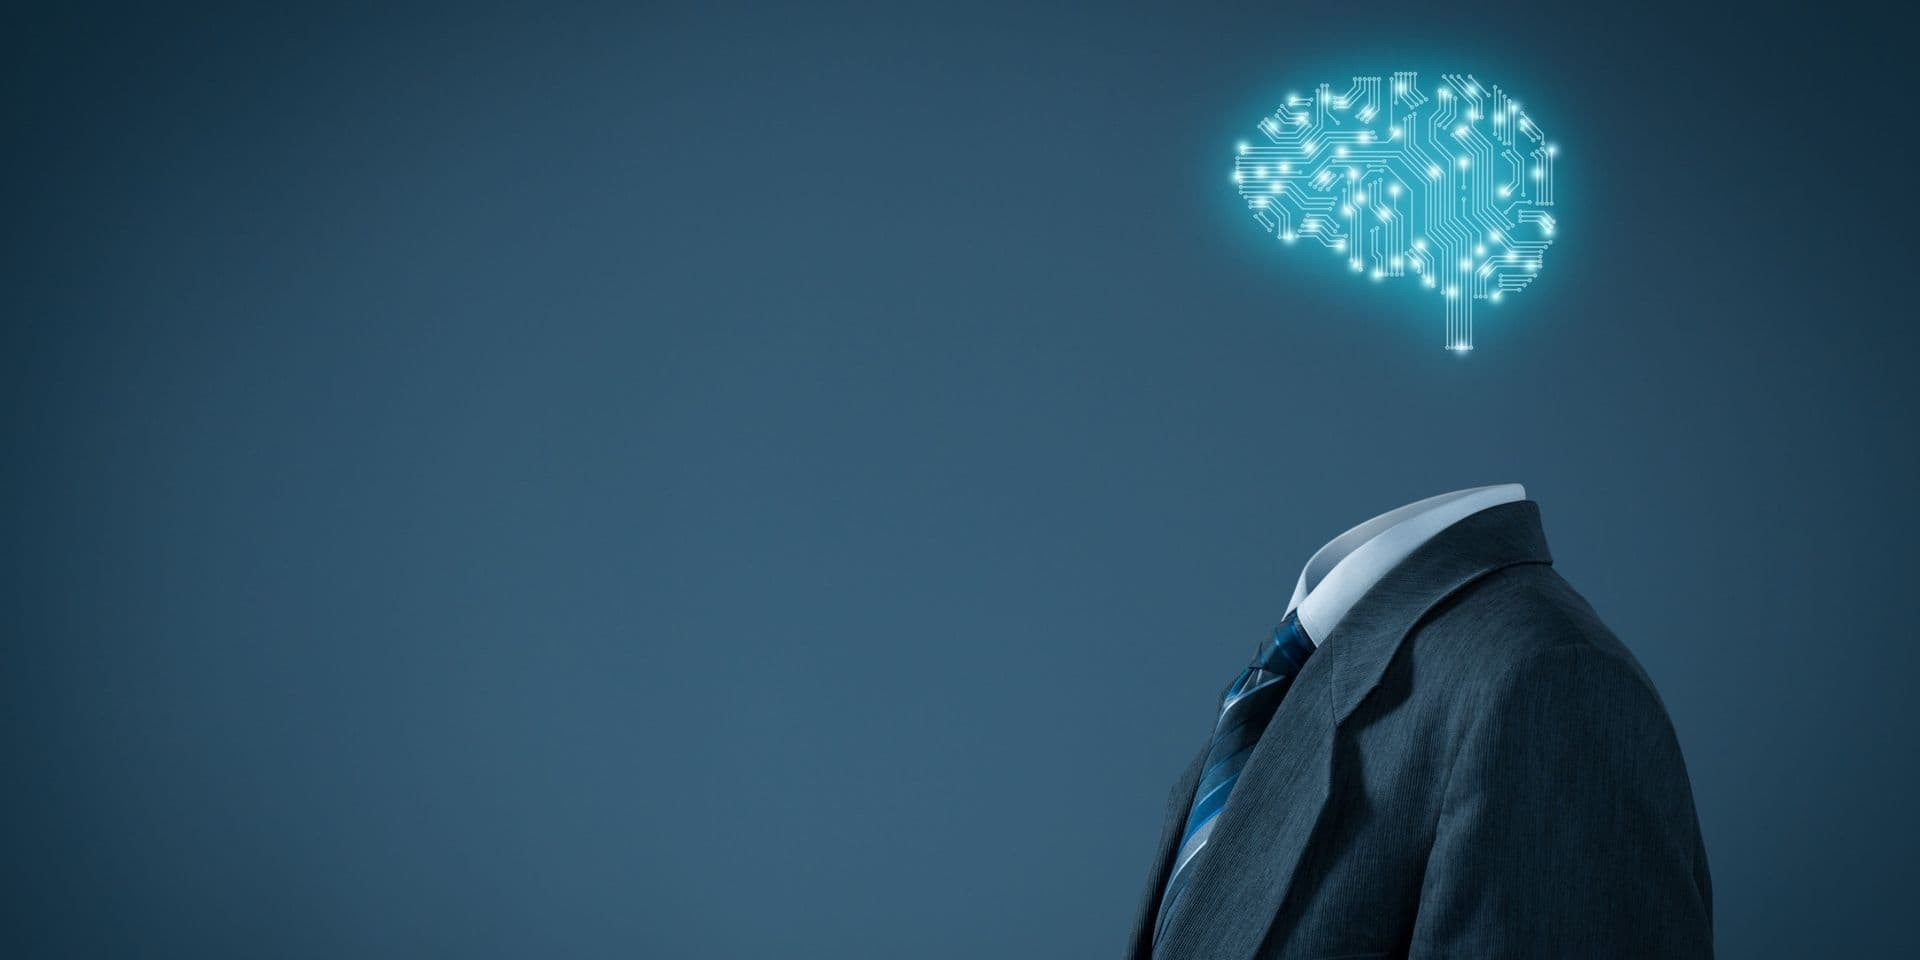 Vers une intelligence augmentée